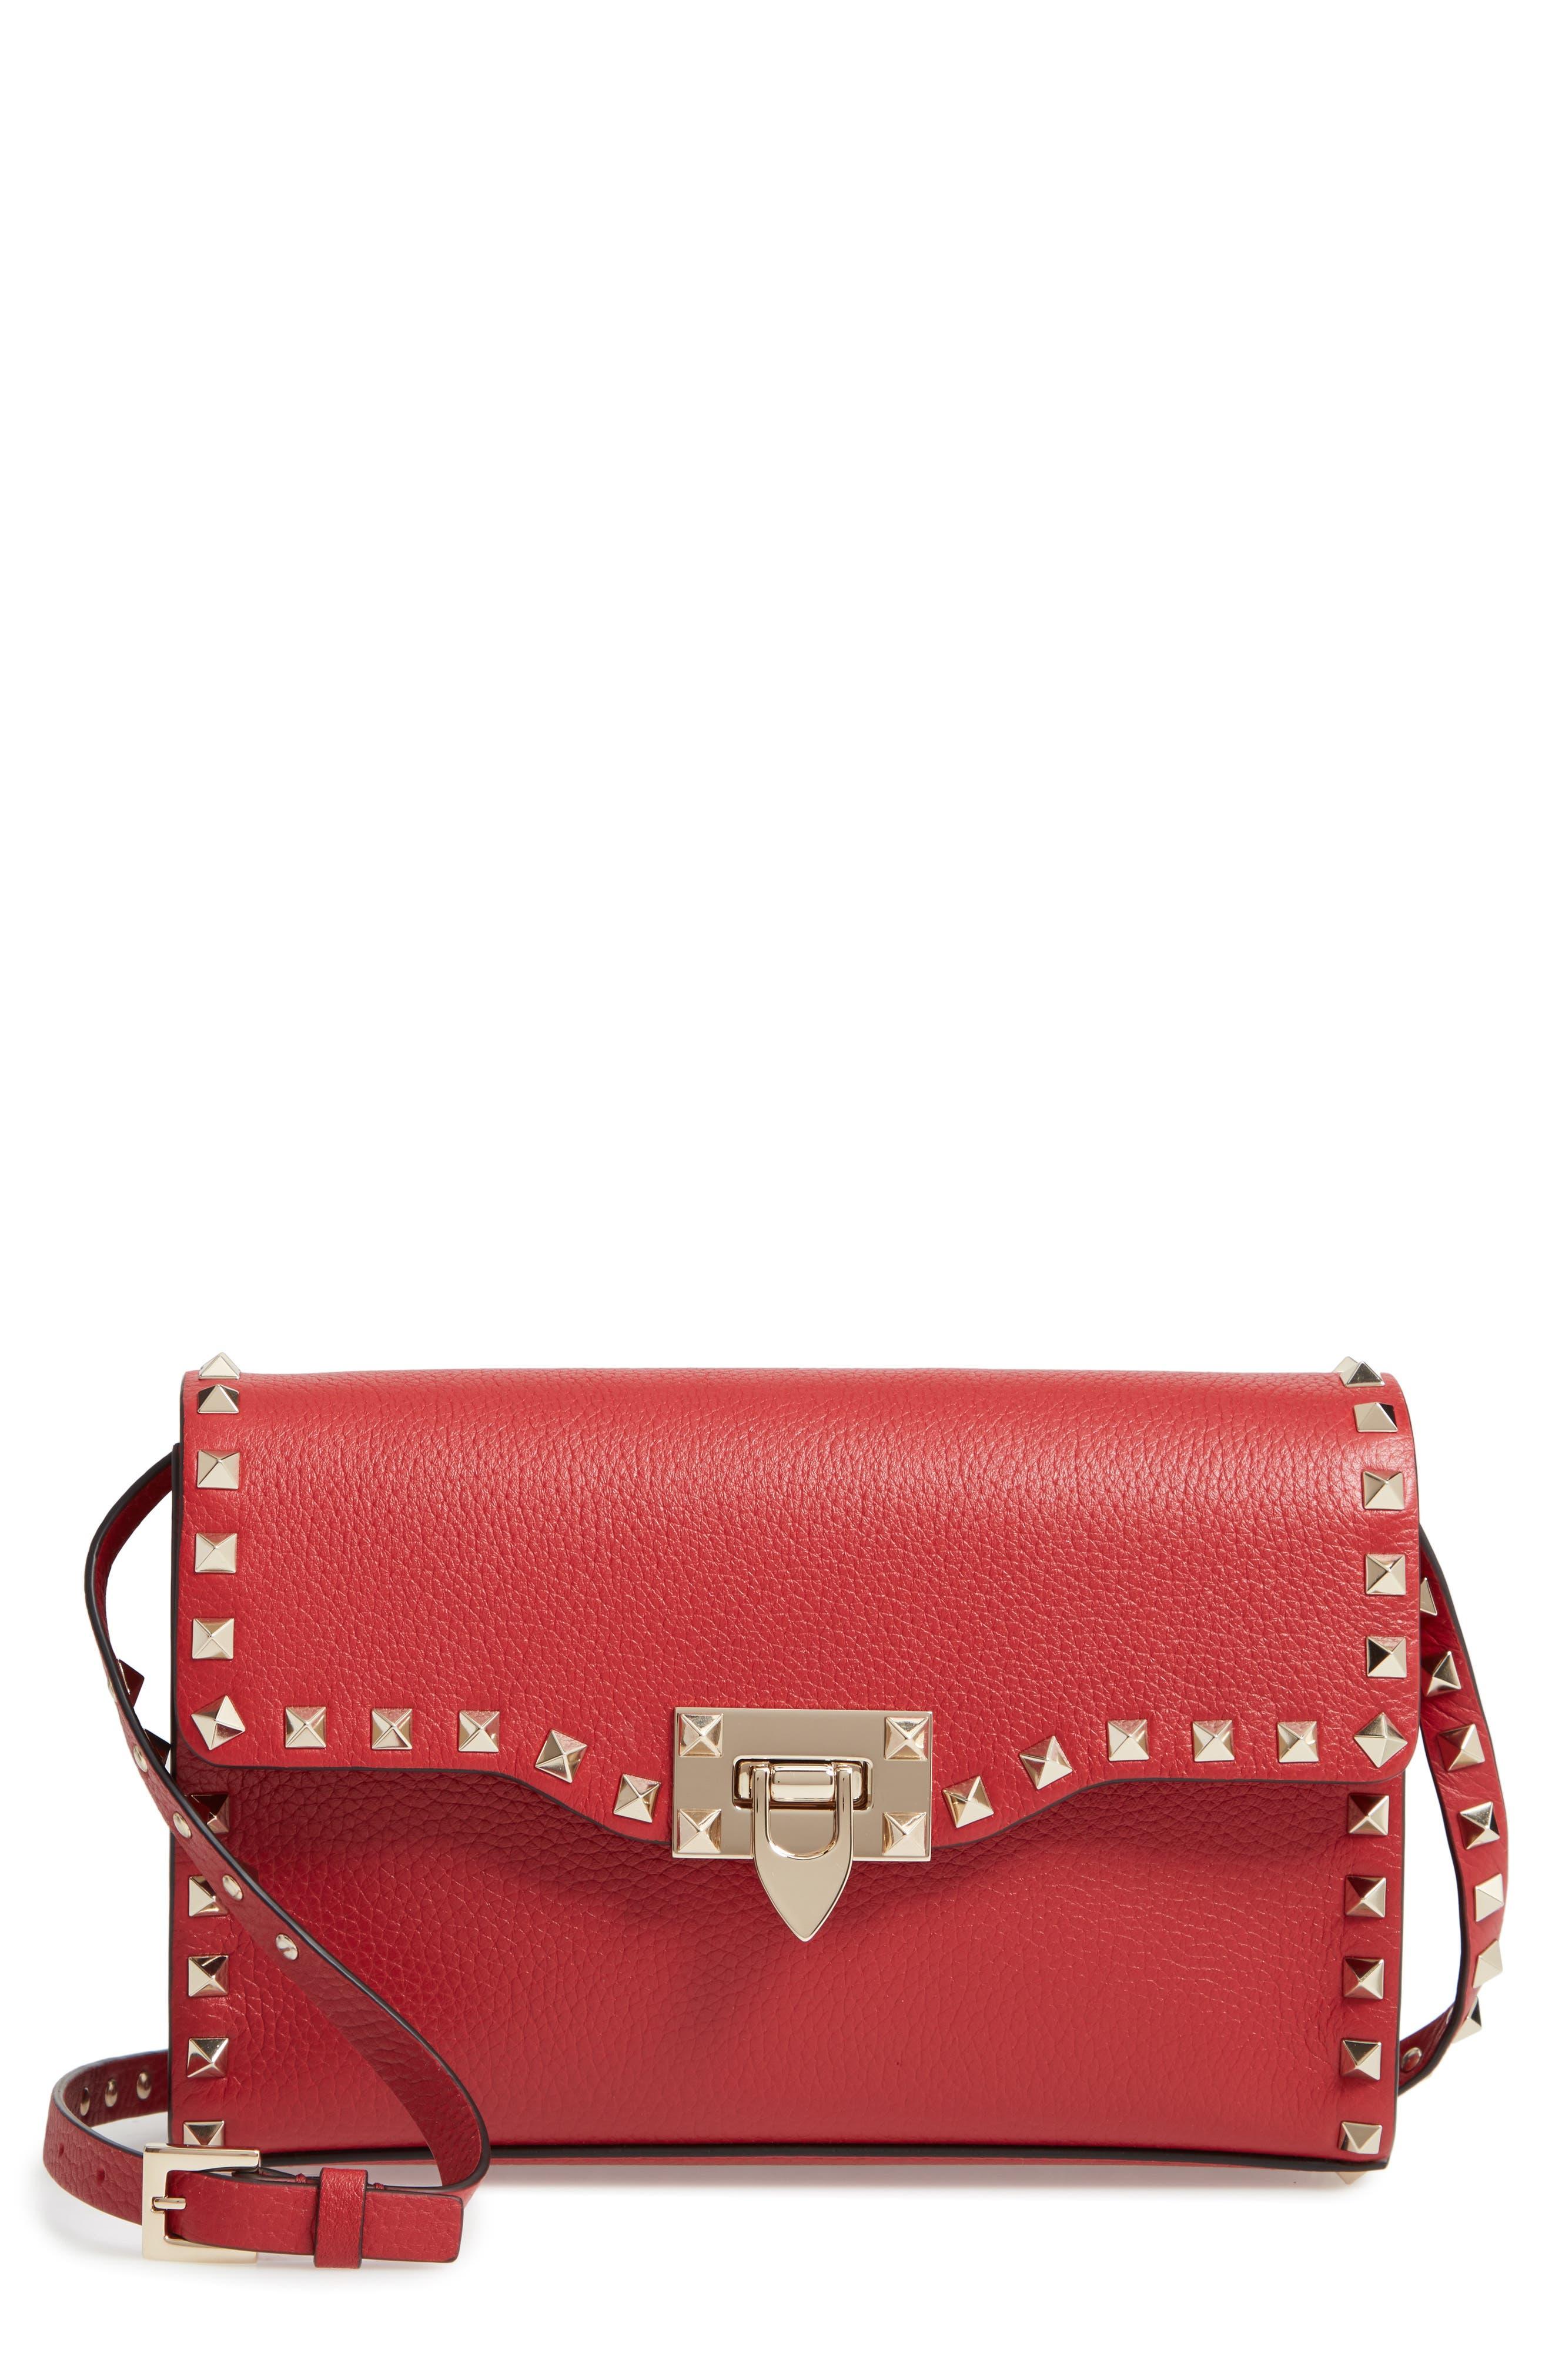 Medium Rockstud Leather Crossbody Bag,                             Main thumbnail 1, color,                             ROSSO V